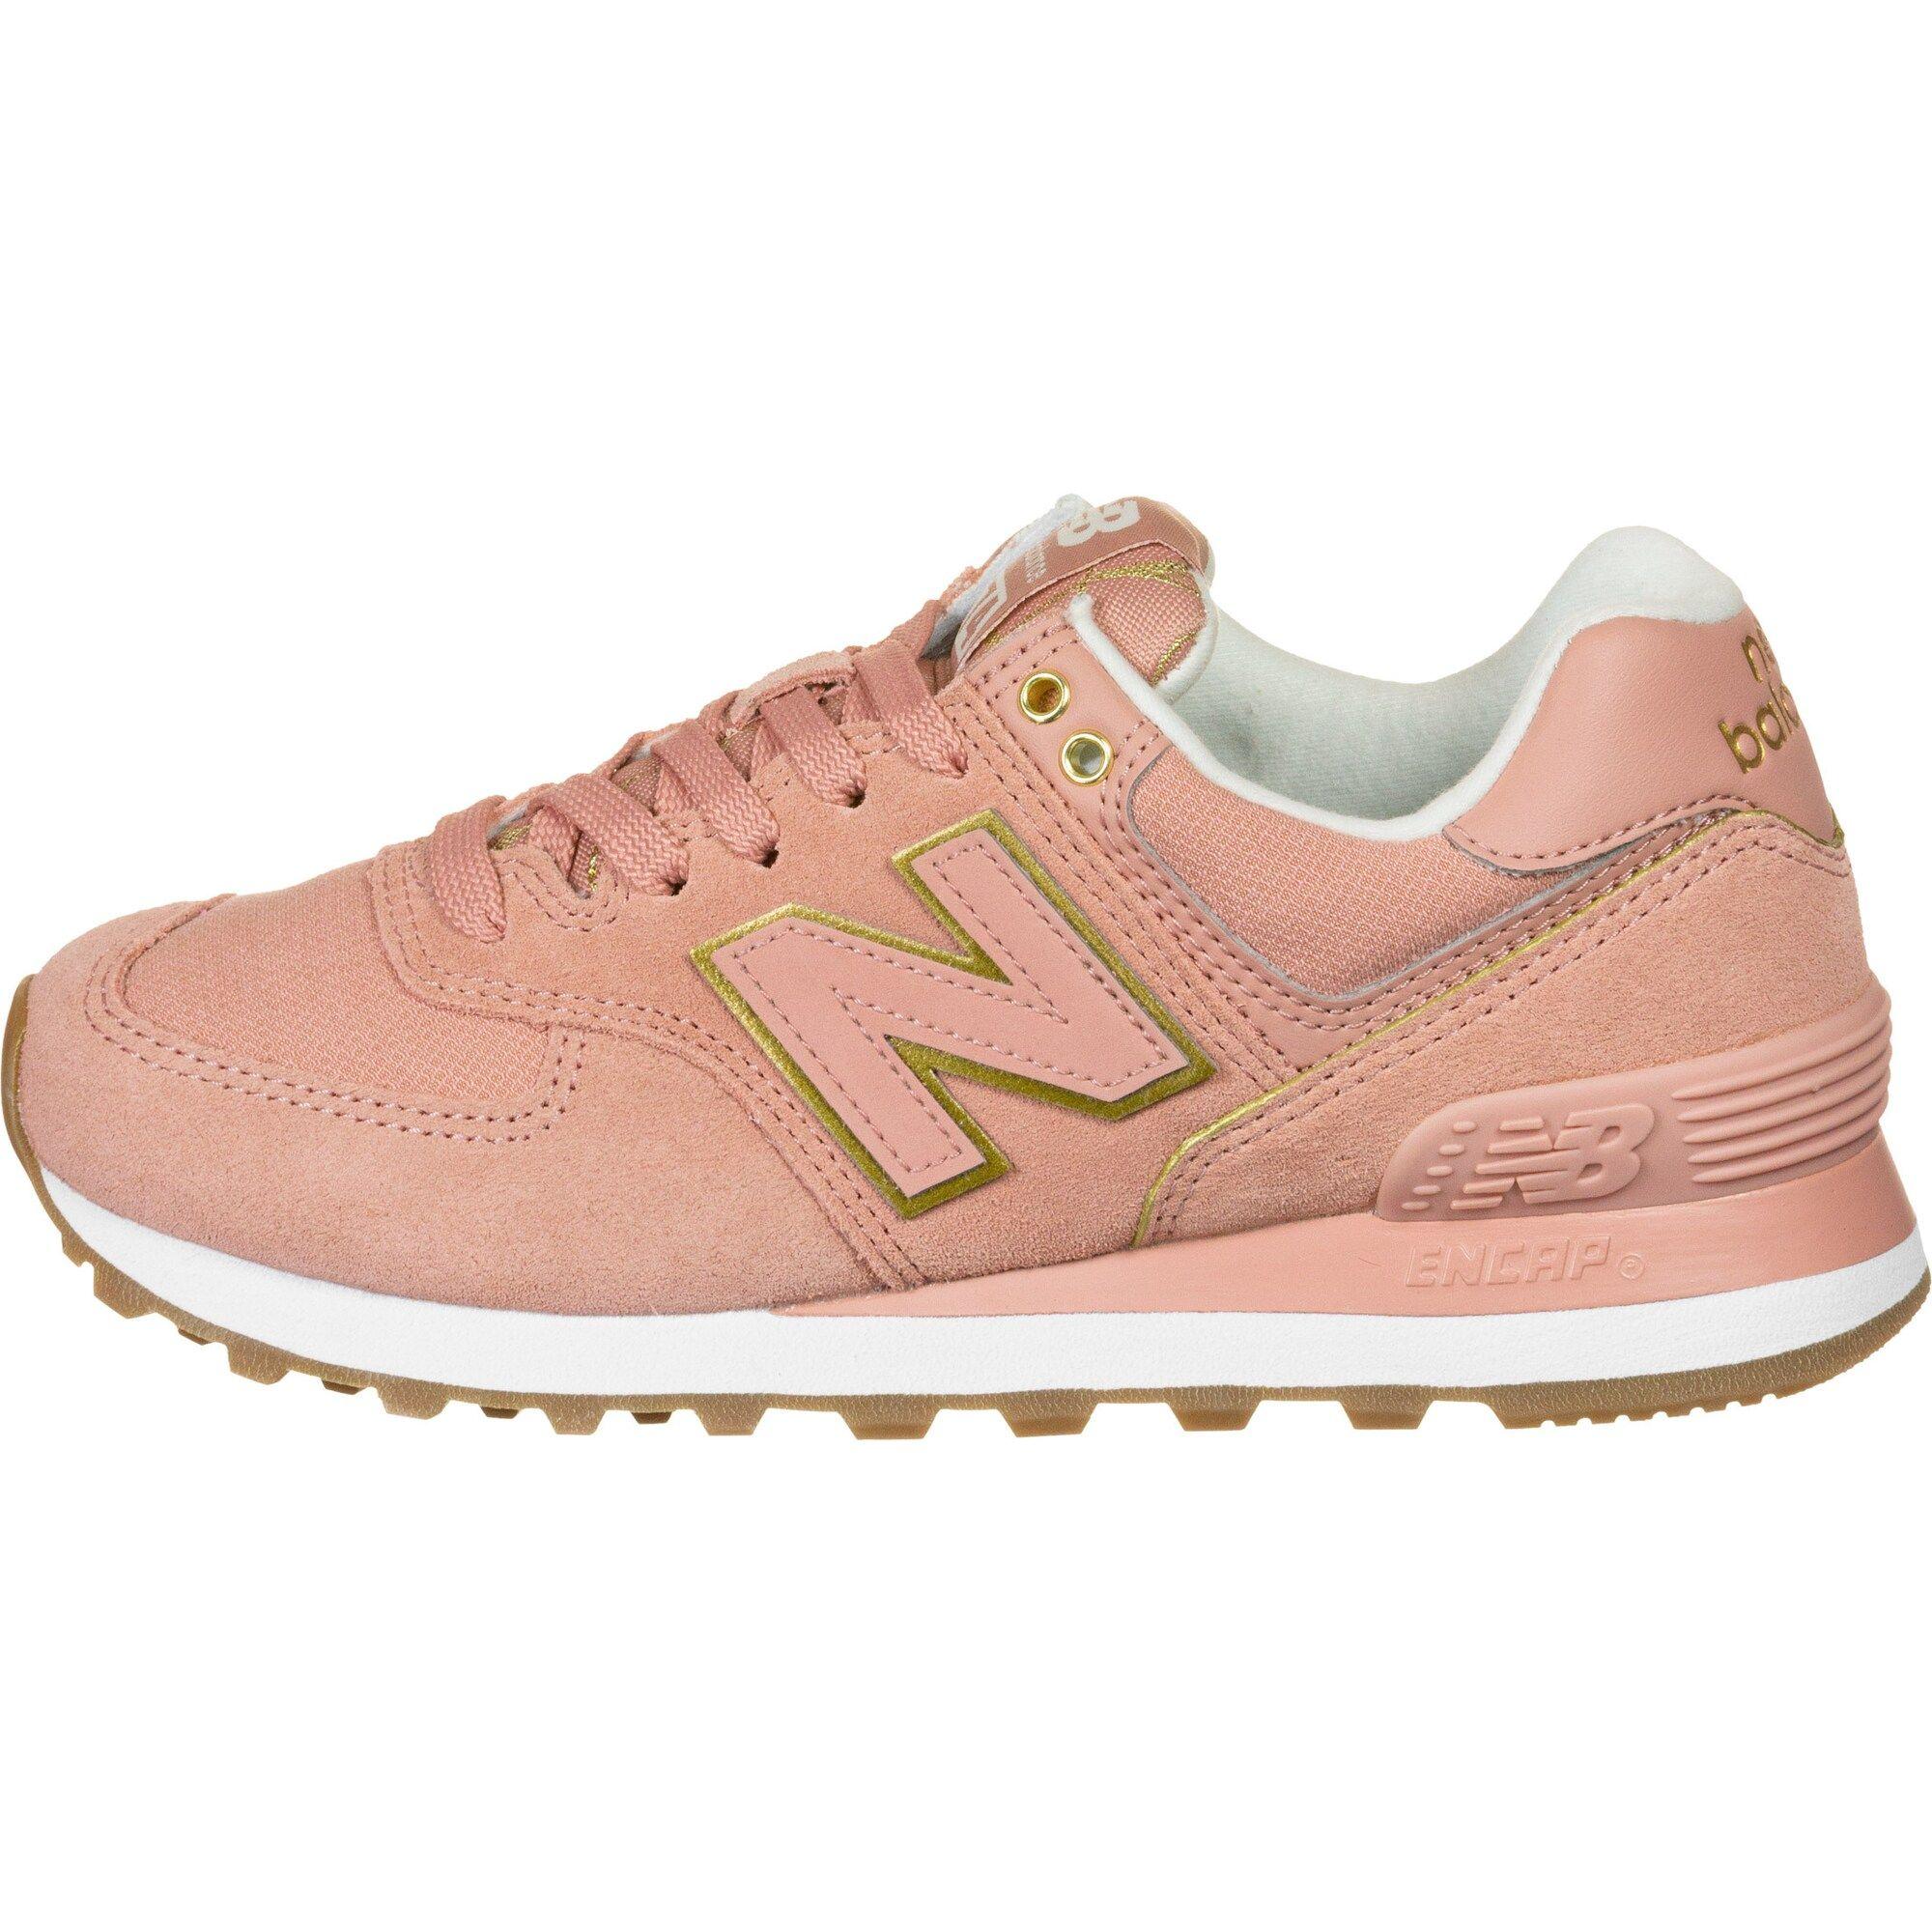 New Balance Schuhe 574 W Damen Altrosa Grosse 36 In 2020 New Balance Schuhe New Balance Und Schuhe